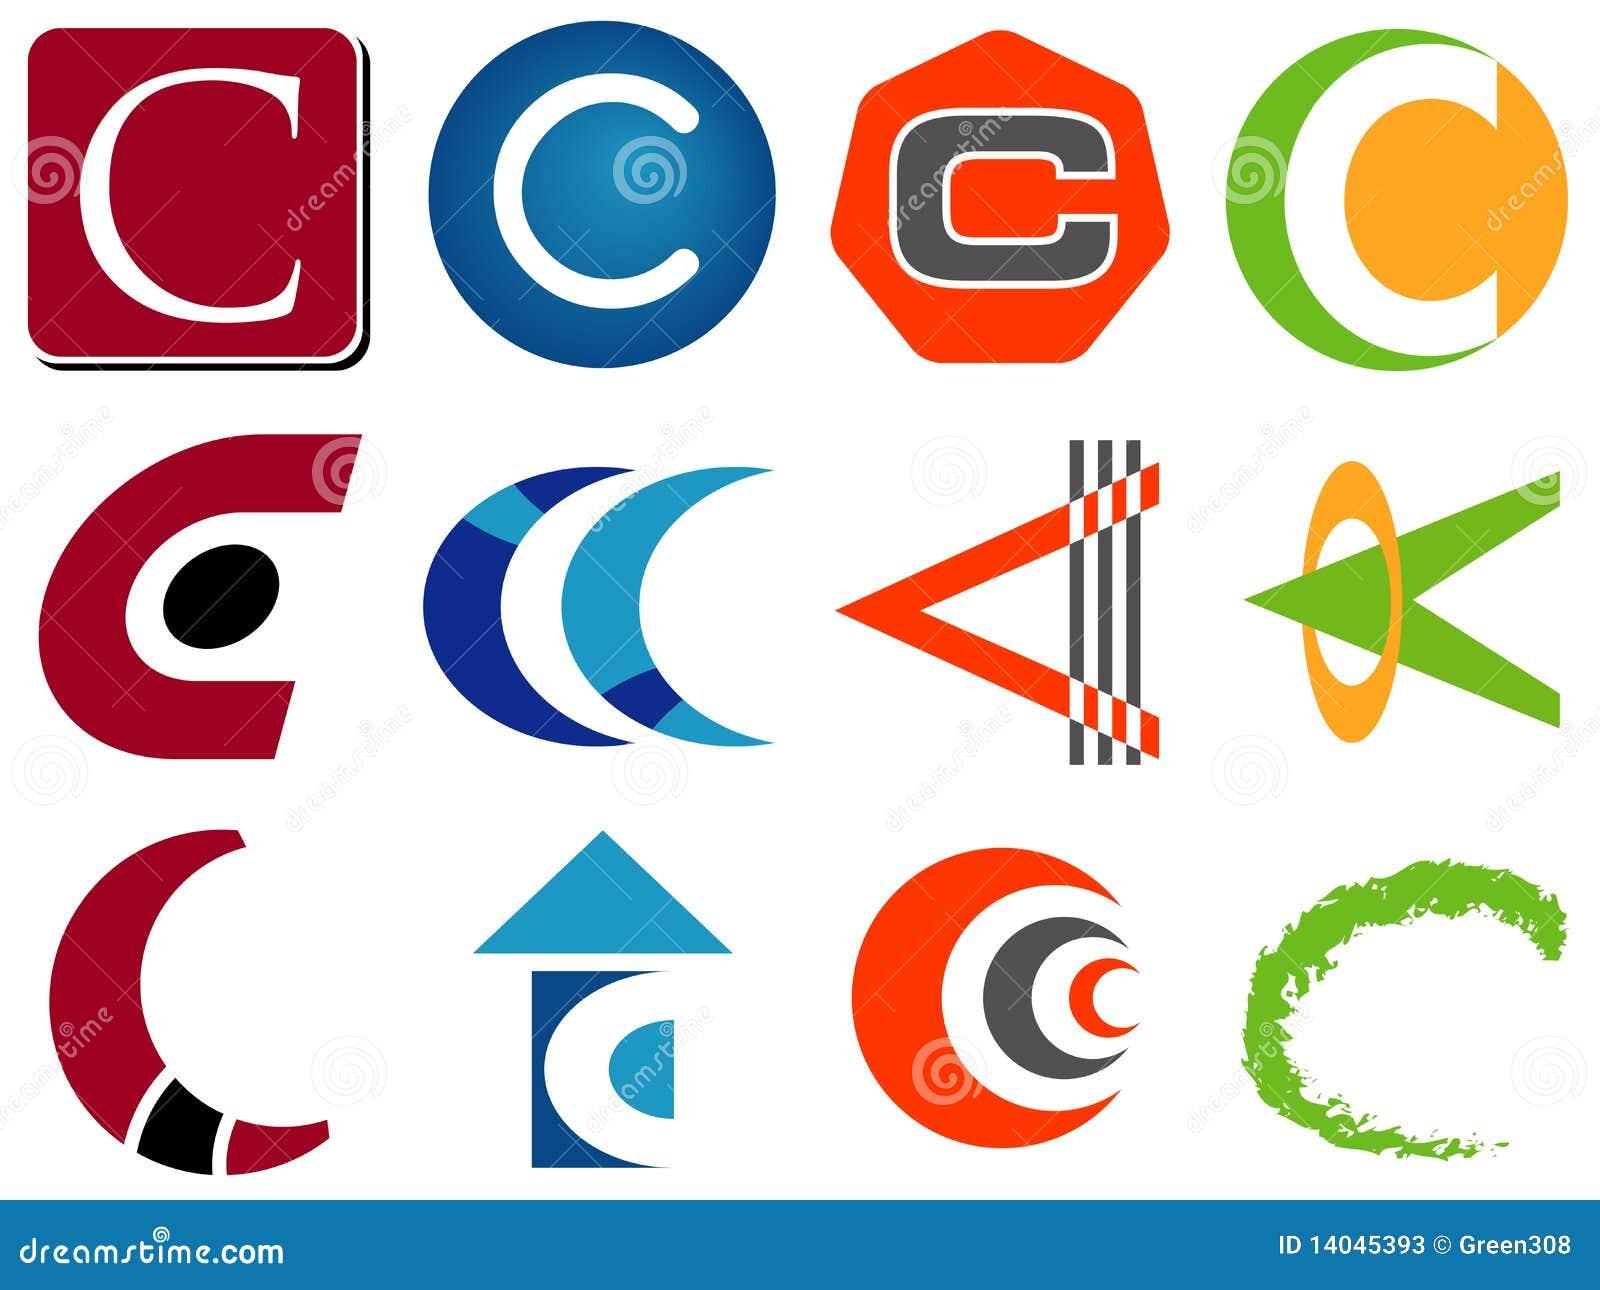 C Logo Images Letter C Logo Icons Stock